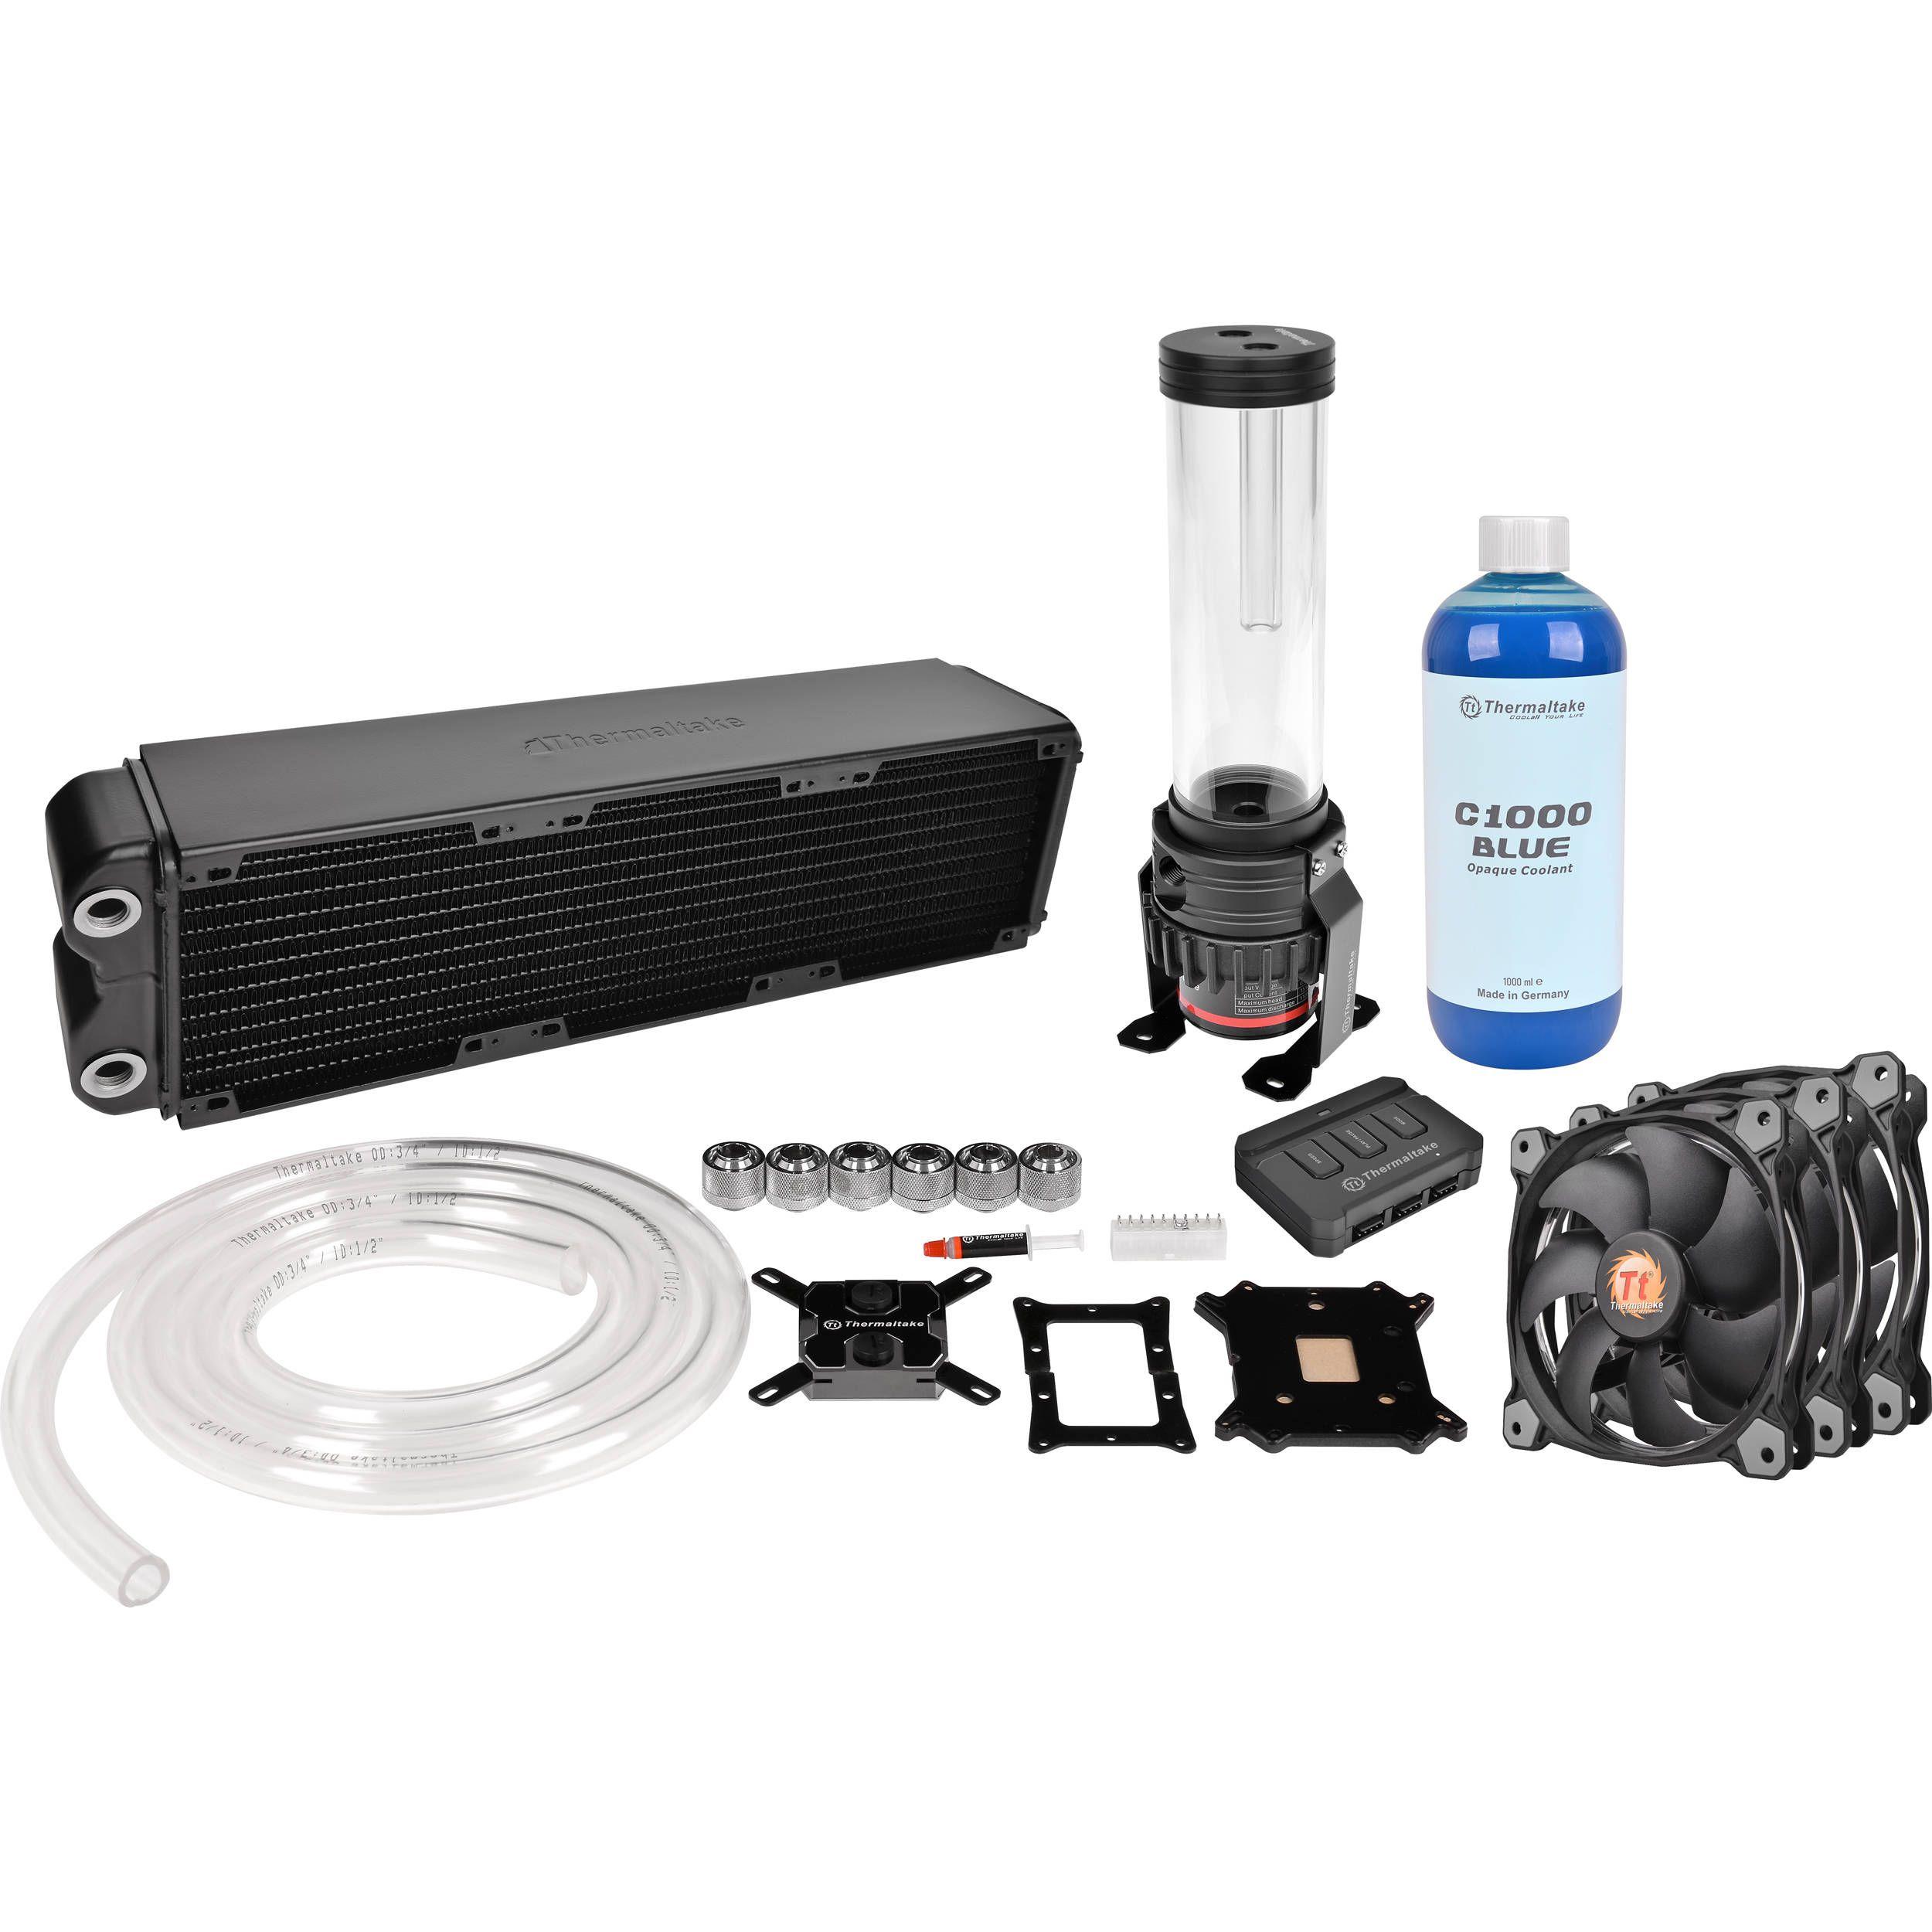 Thermaltake Pacific Rl360 Pc Water Cooling Kit Water Cooling